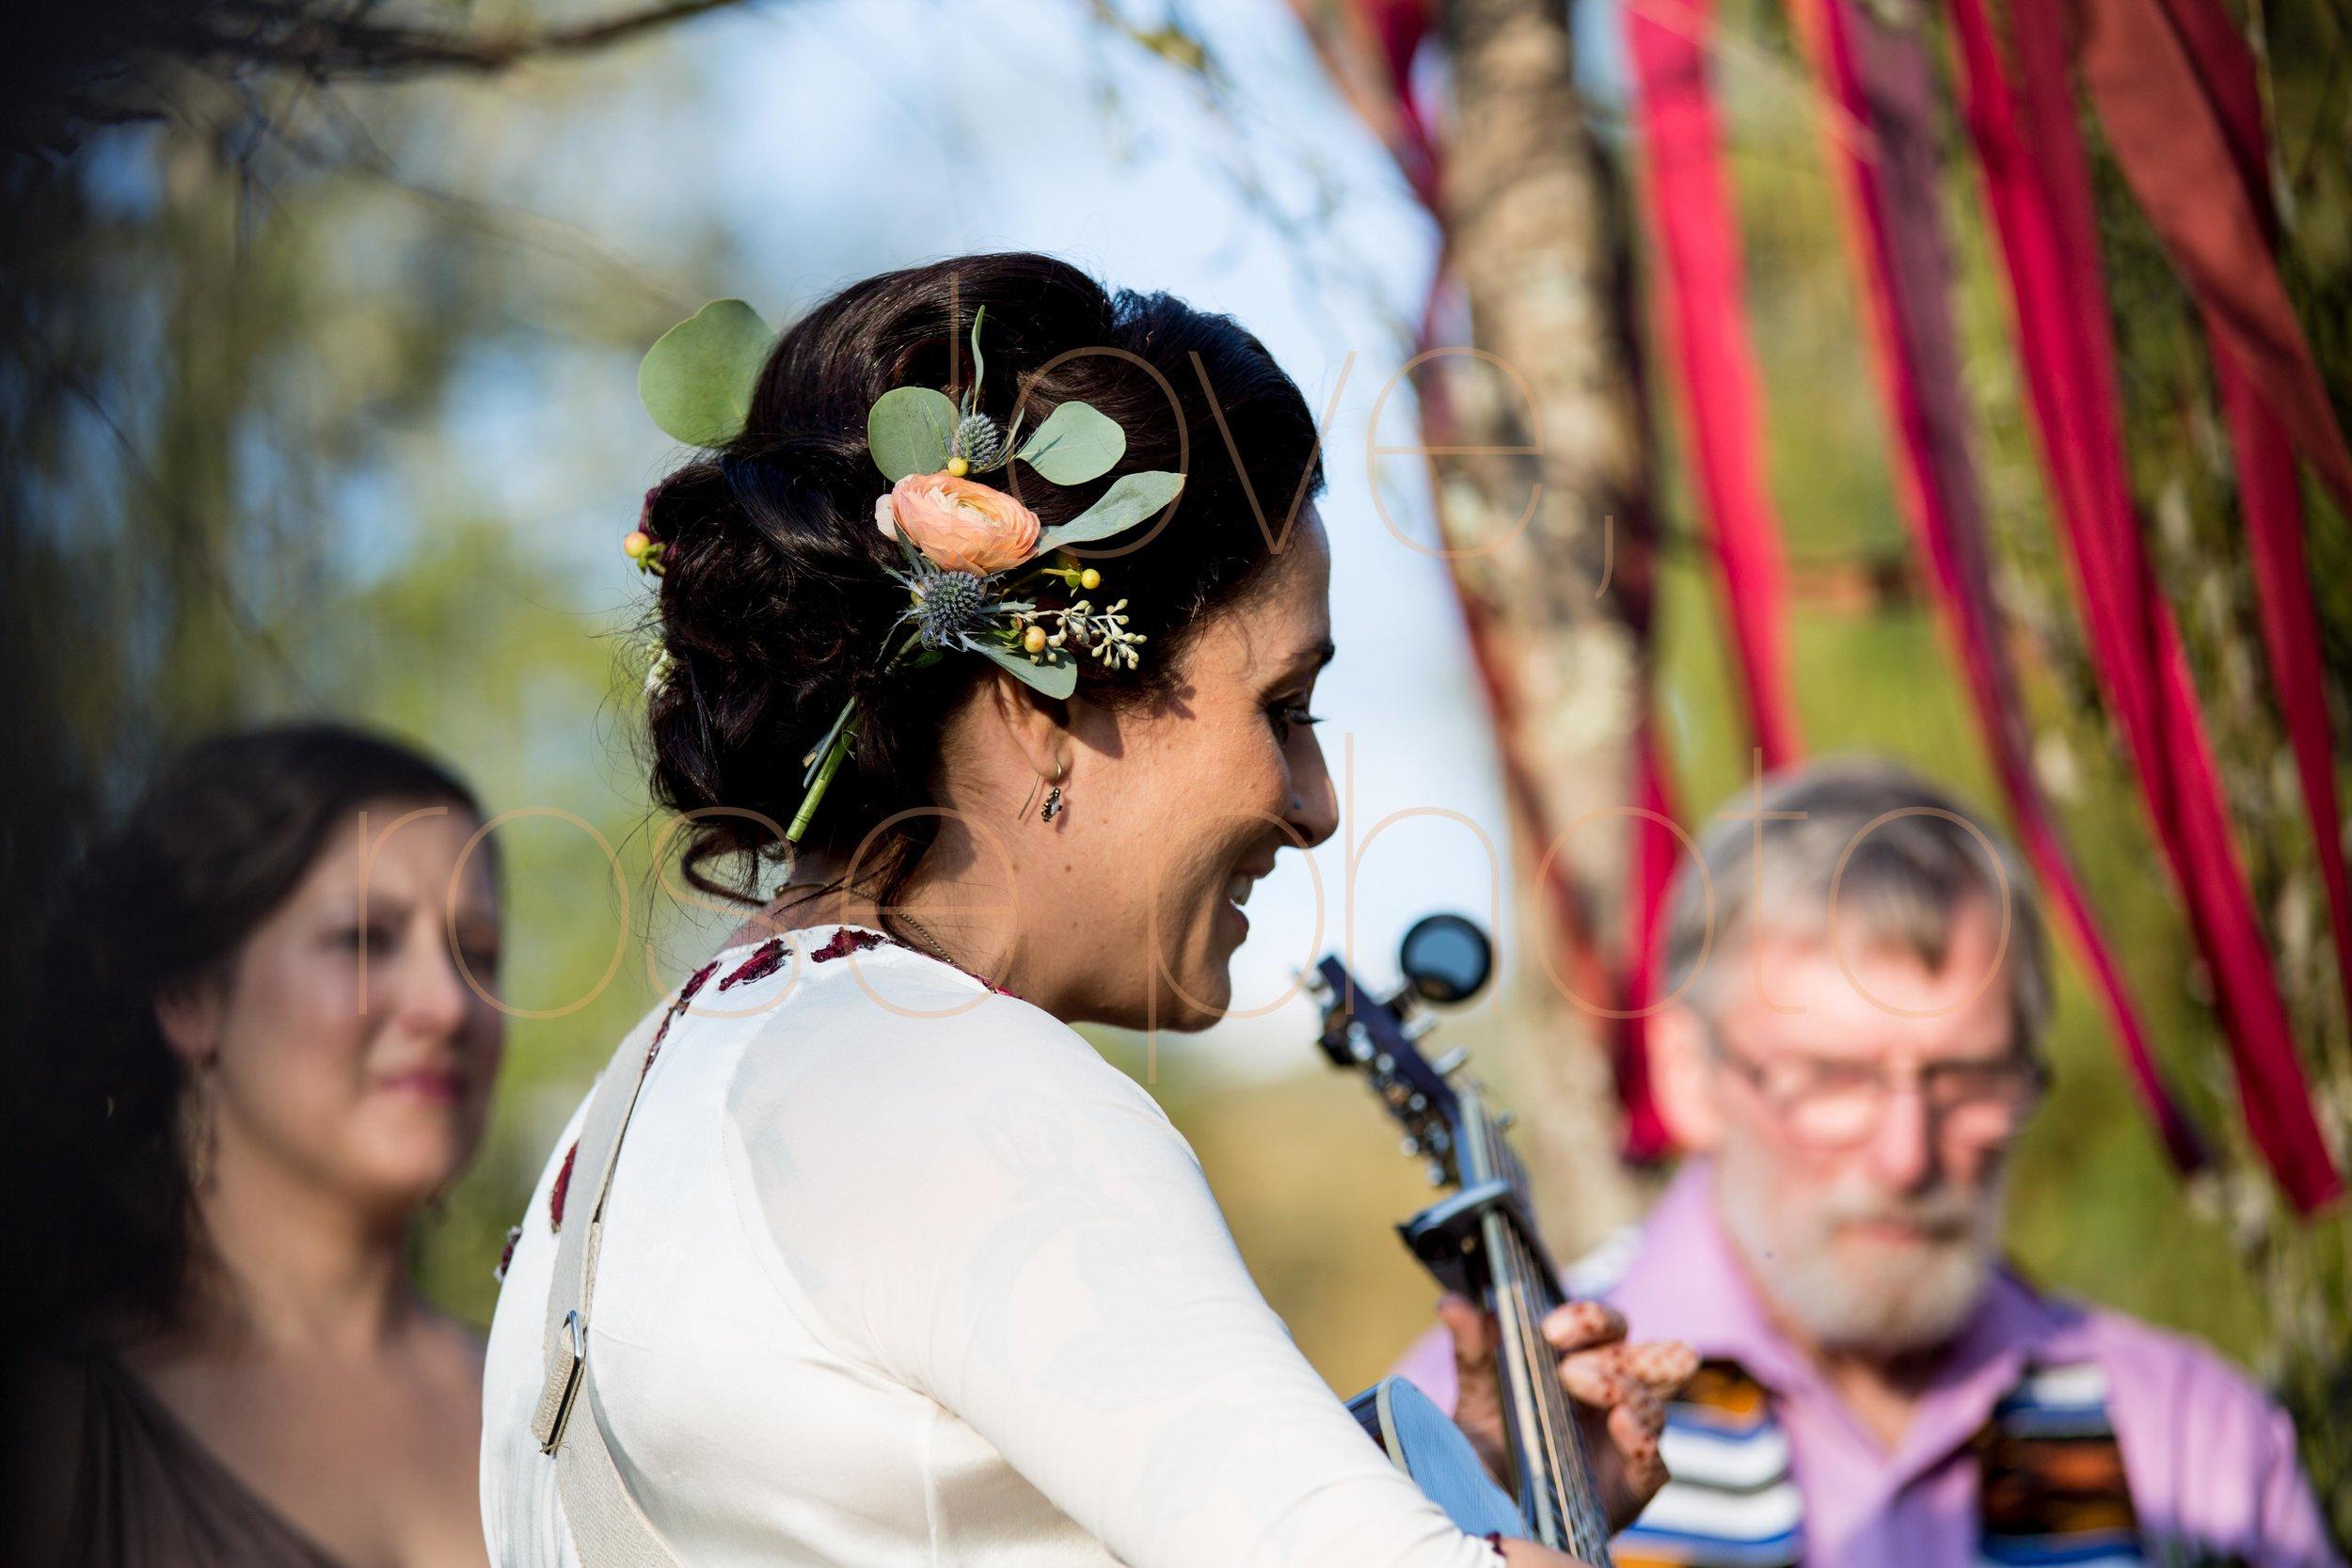 Jane Krame + Jason Ashevegas married asheville best wedding photographers -45.jpg